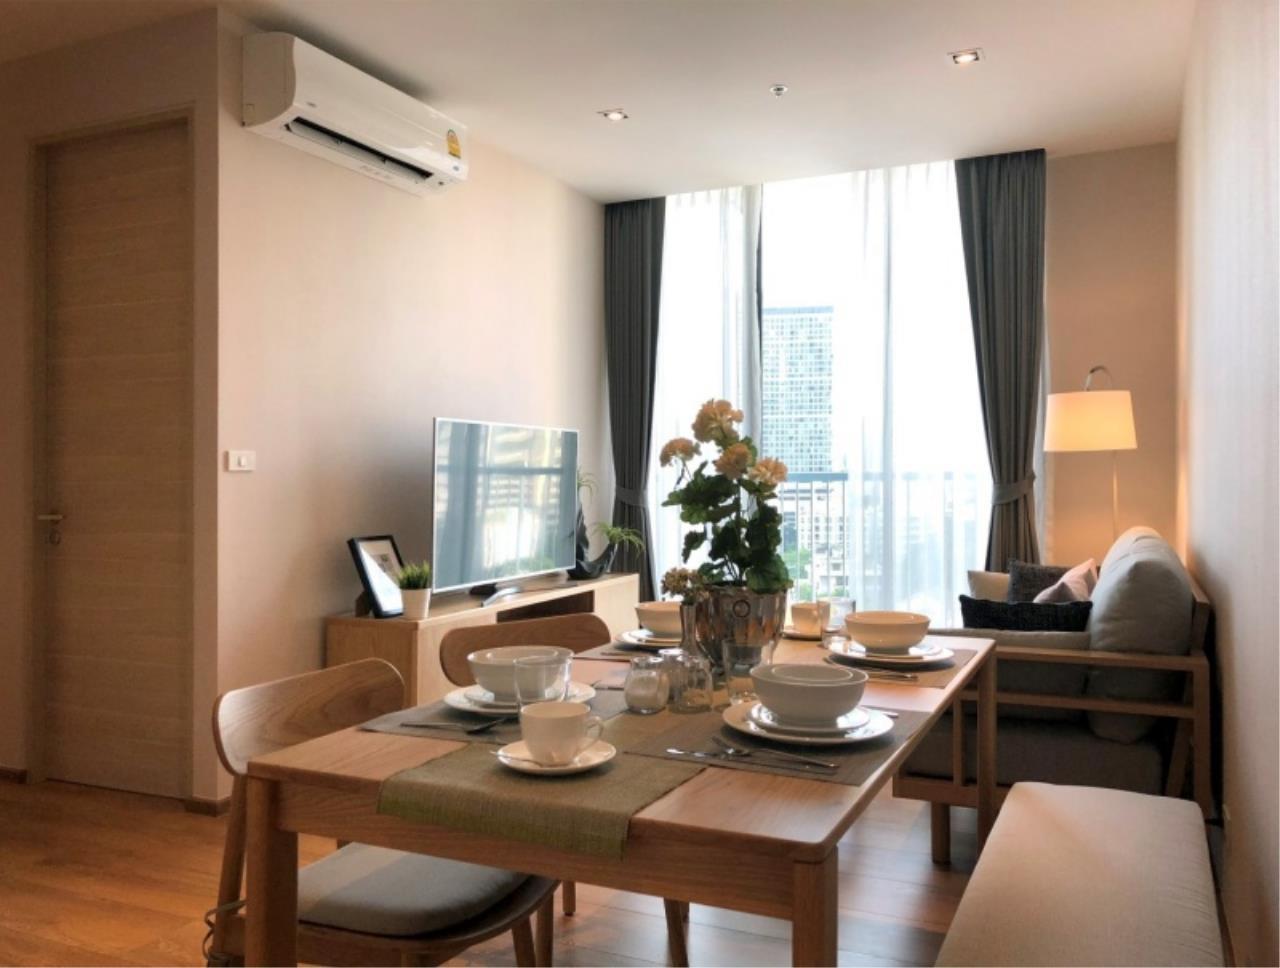 Century21 Skylux Agency's Park 24 / Condo For Rent / 2 Bedroom / 53.53 SQM / BTS Phrom Phong / Bangkok 2